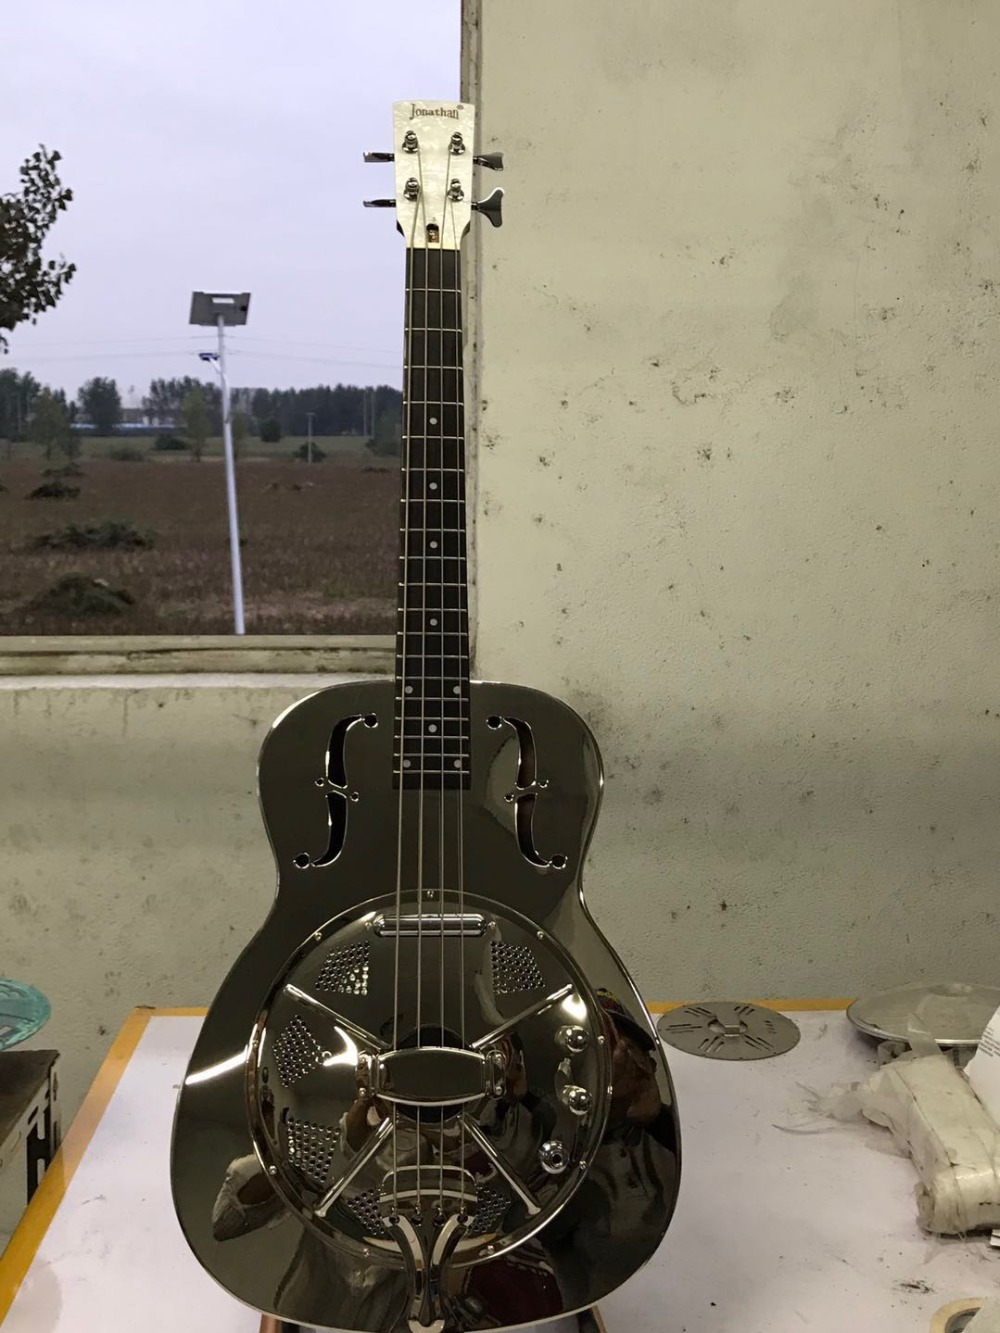 jonathan resonator bass guitar resophonic bass guitars metal body duolian guitar in guitar. Black Bedroom Furniture Sets. Home Design Ideas